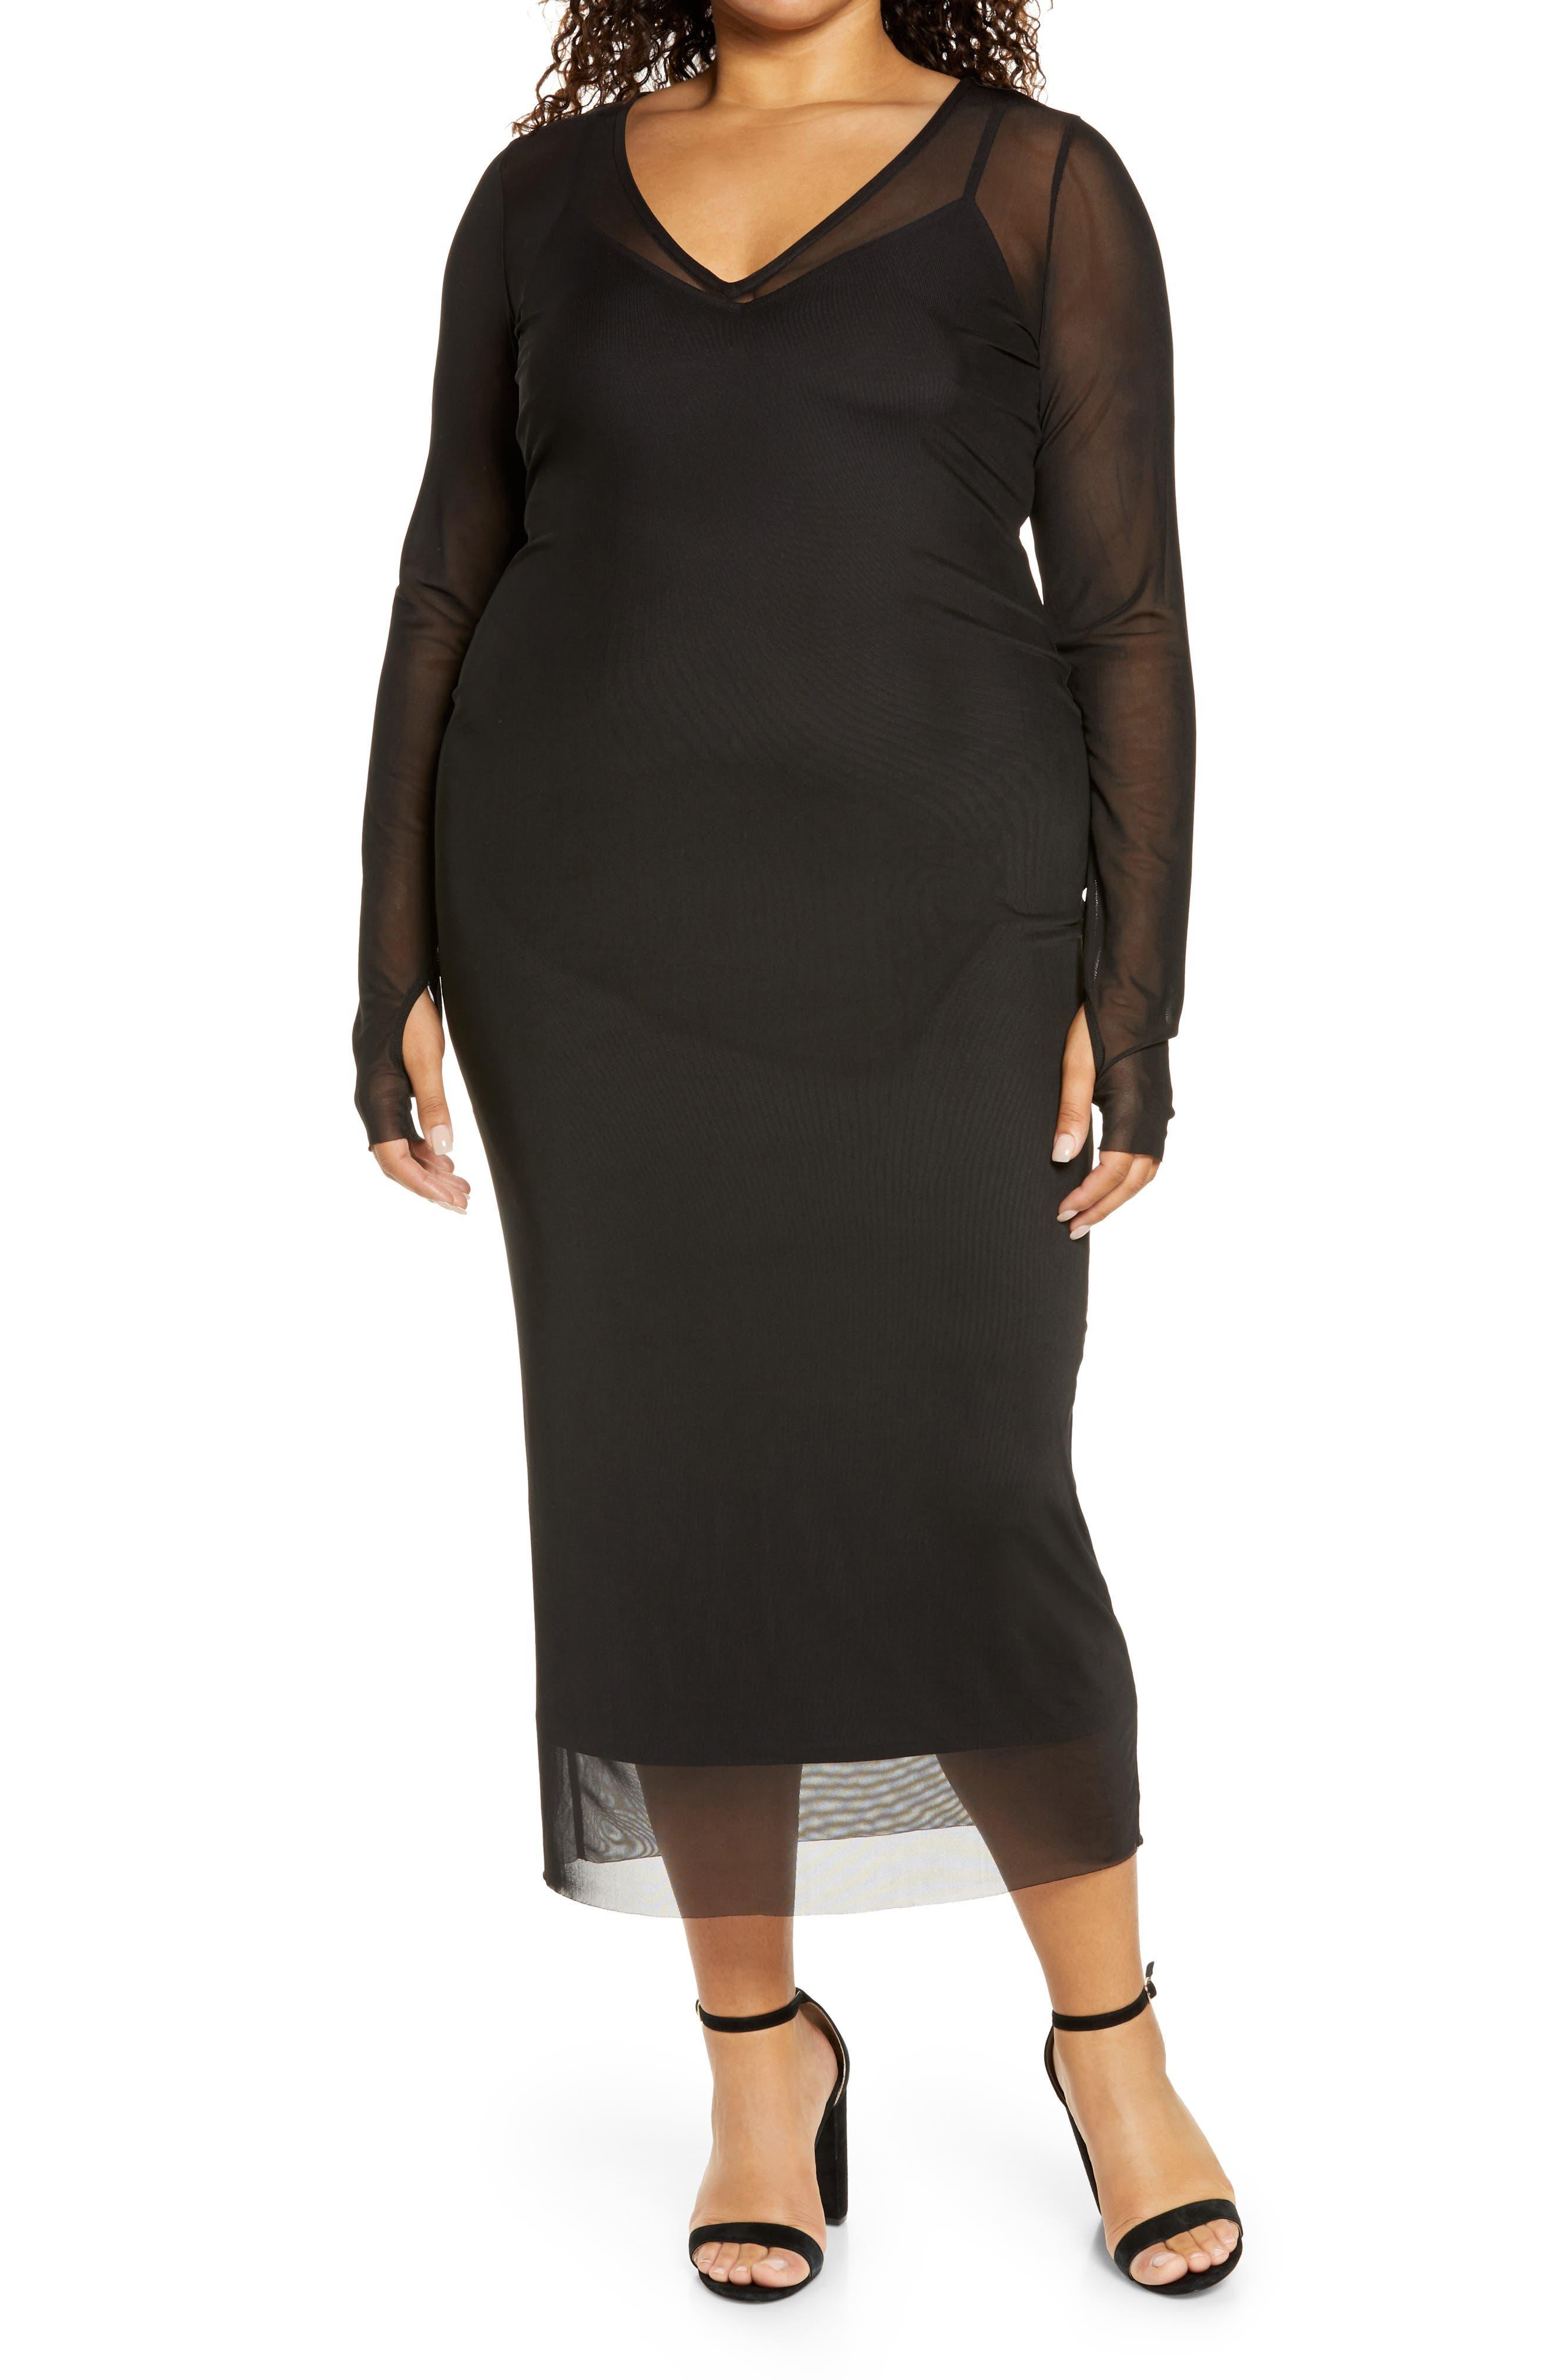 Image of AFRM Azani V-Neck Power Mesh Dress